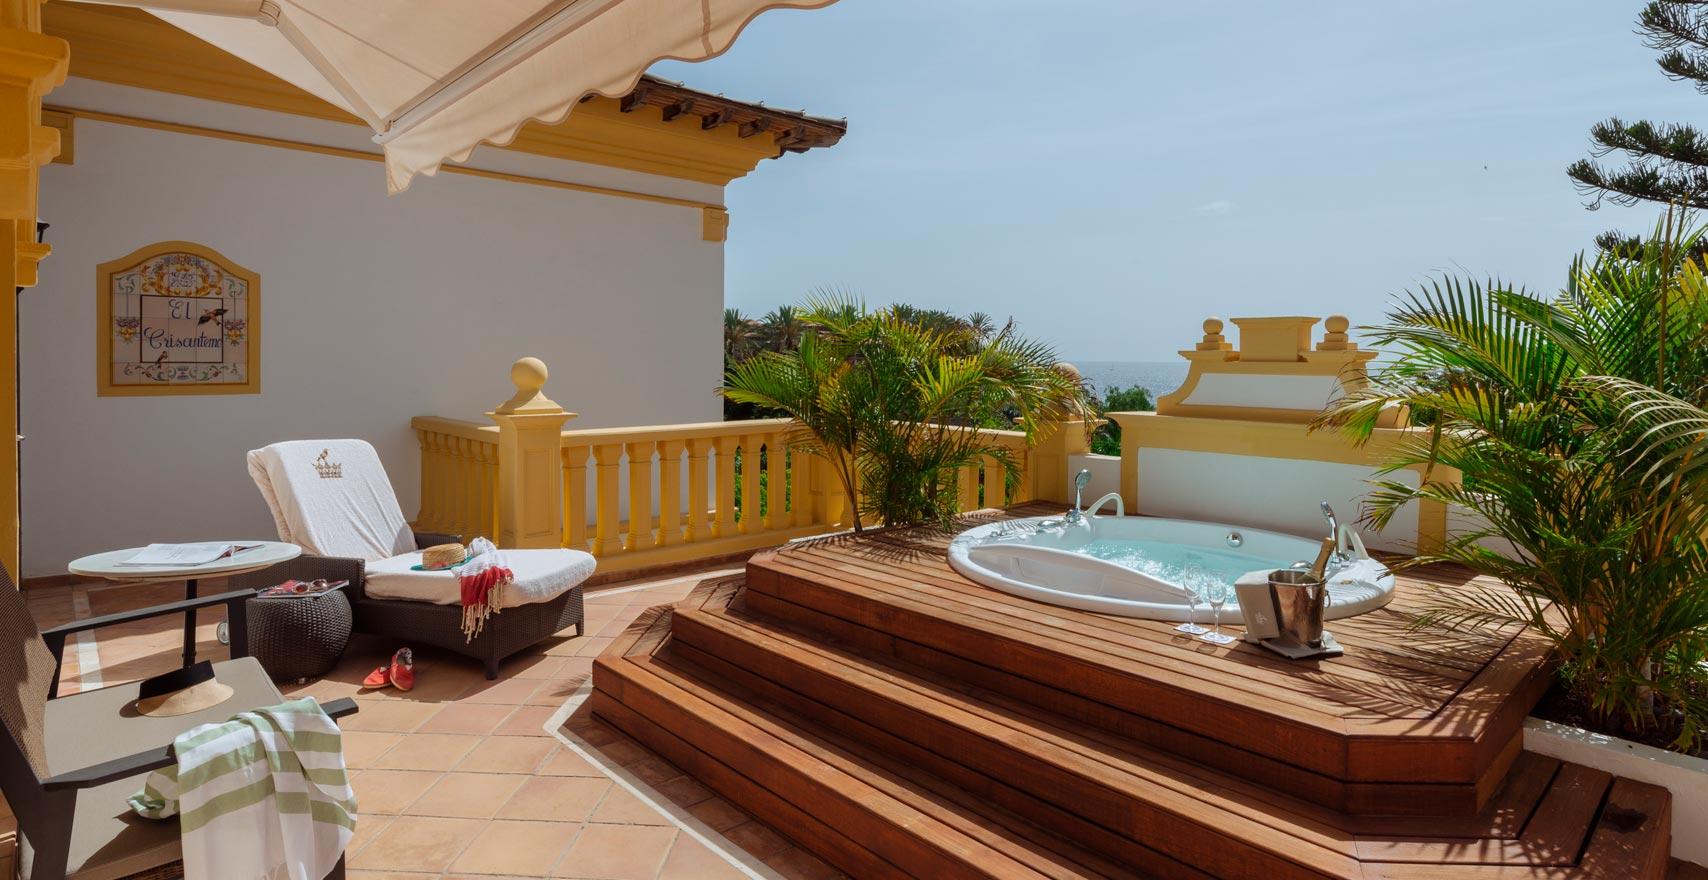 Presidential Suite Casas Ducales terrace